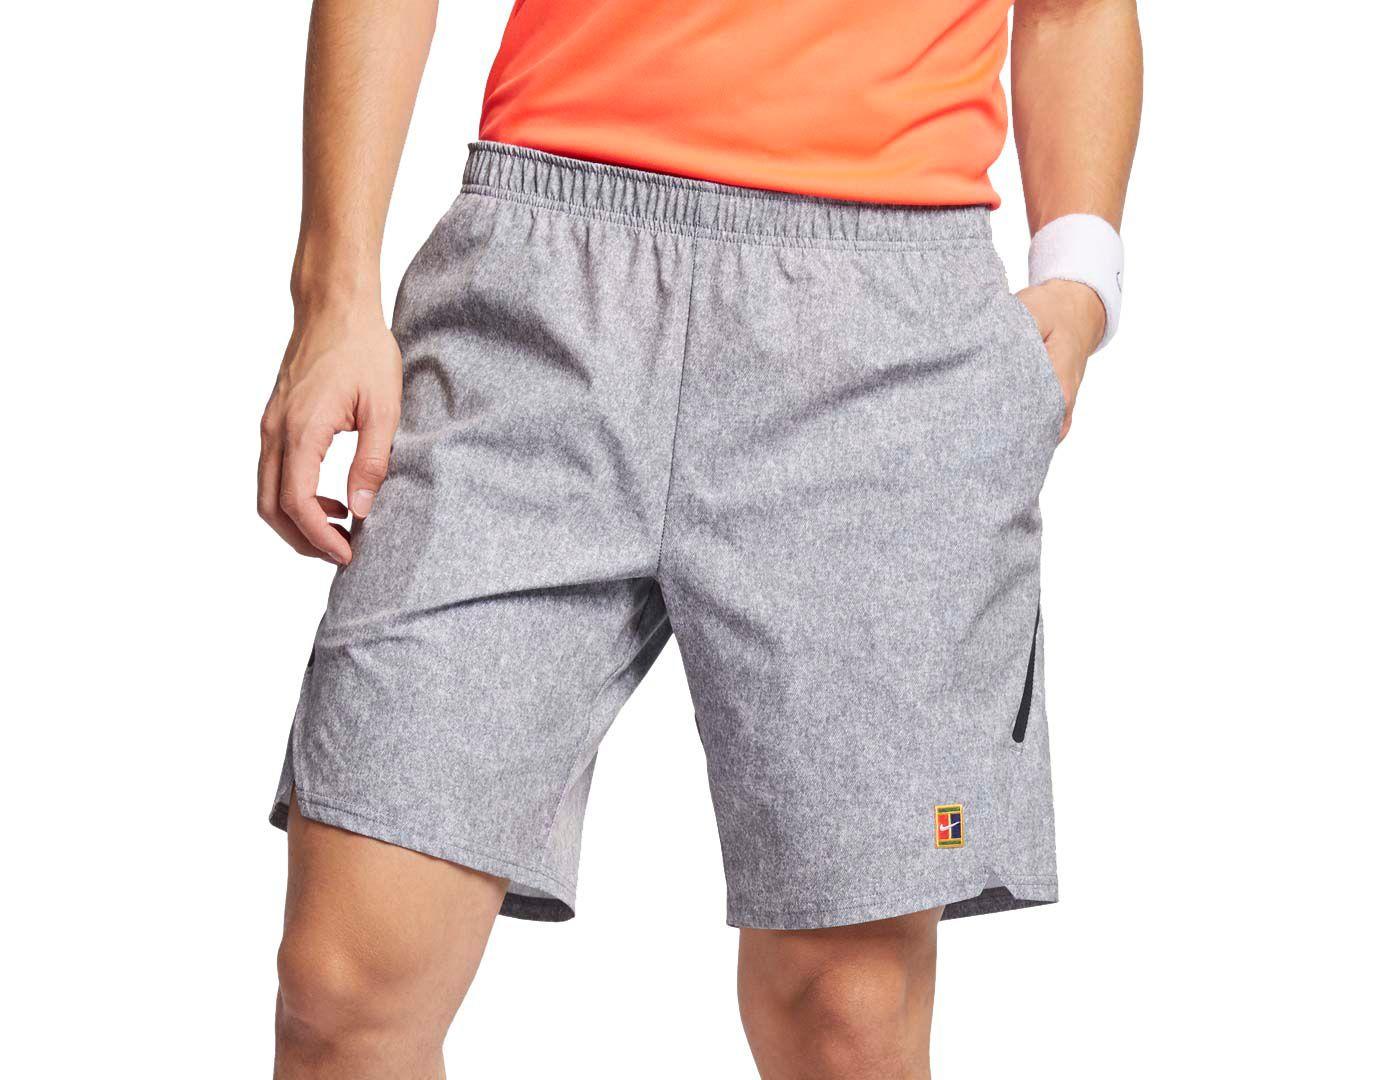 Nike Men's NikeCourt Flex Ace Printed Tennis Shorts